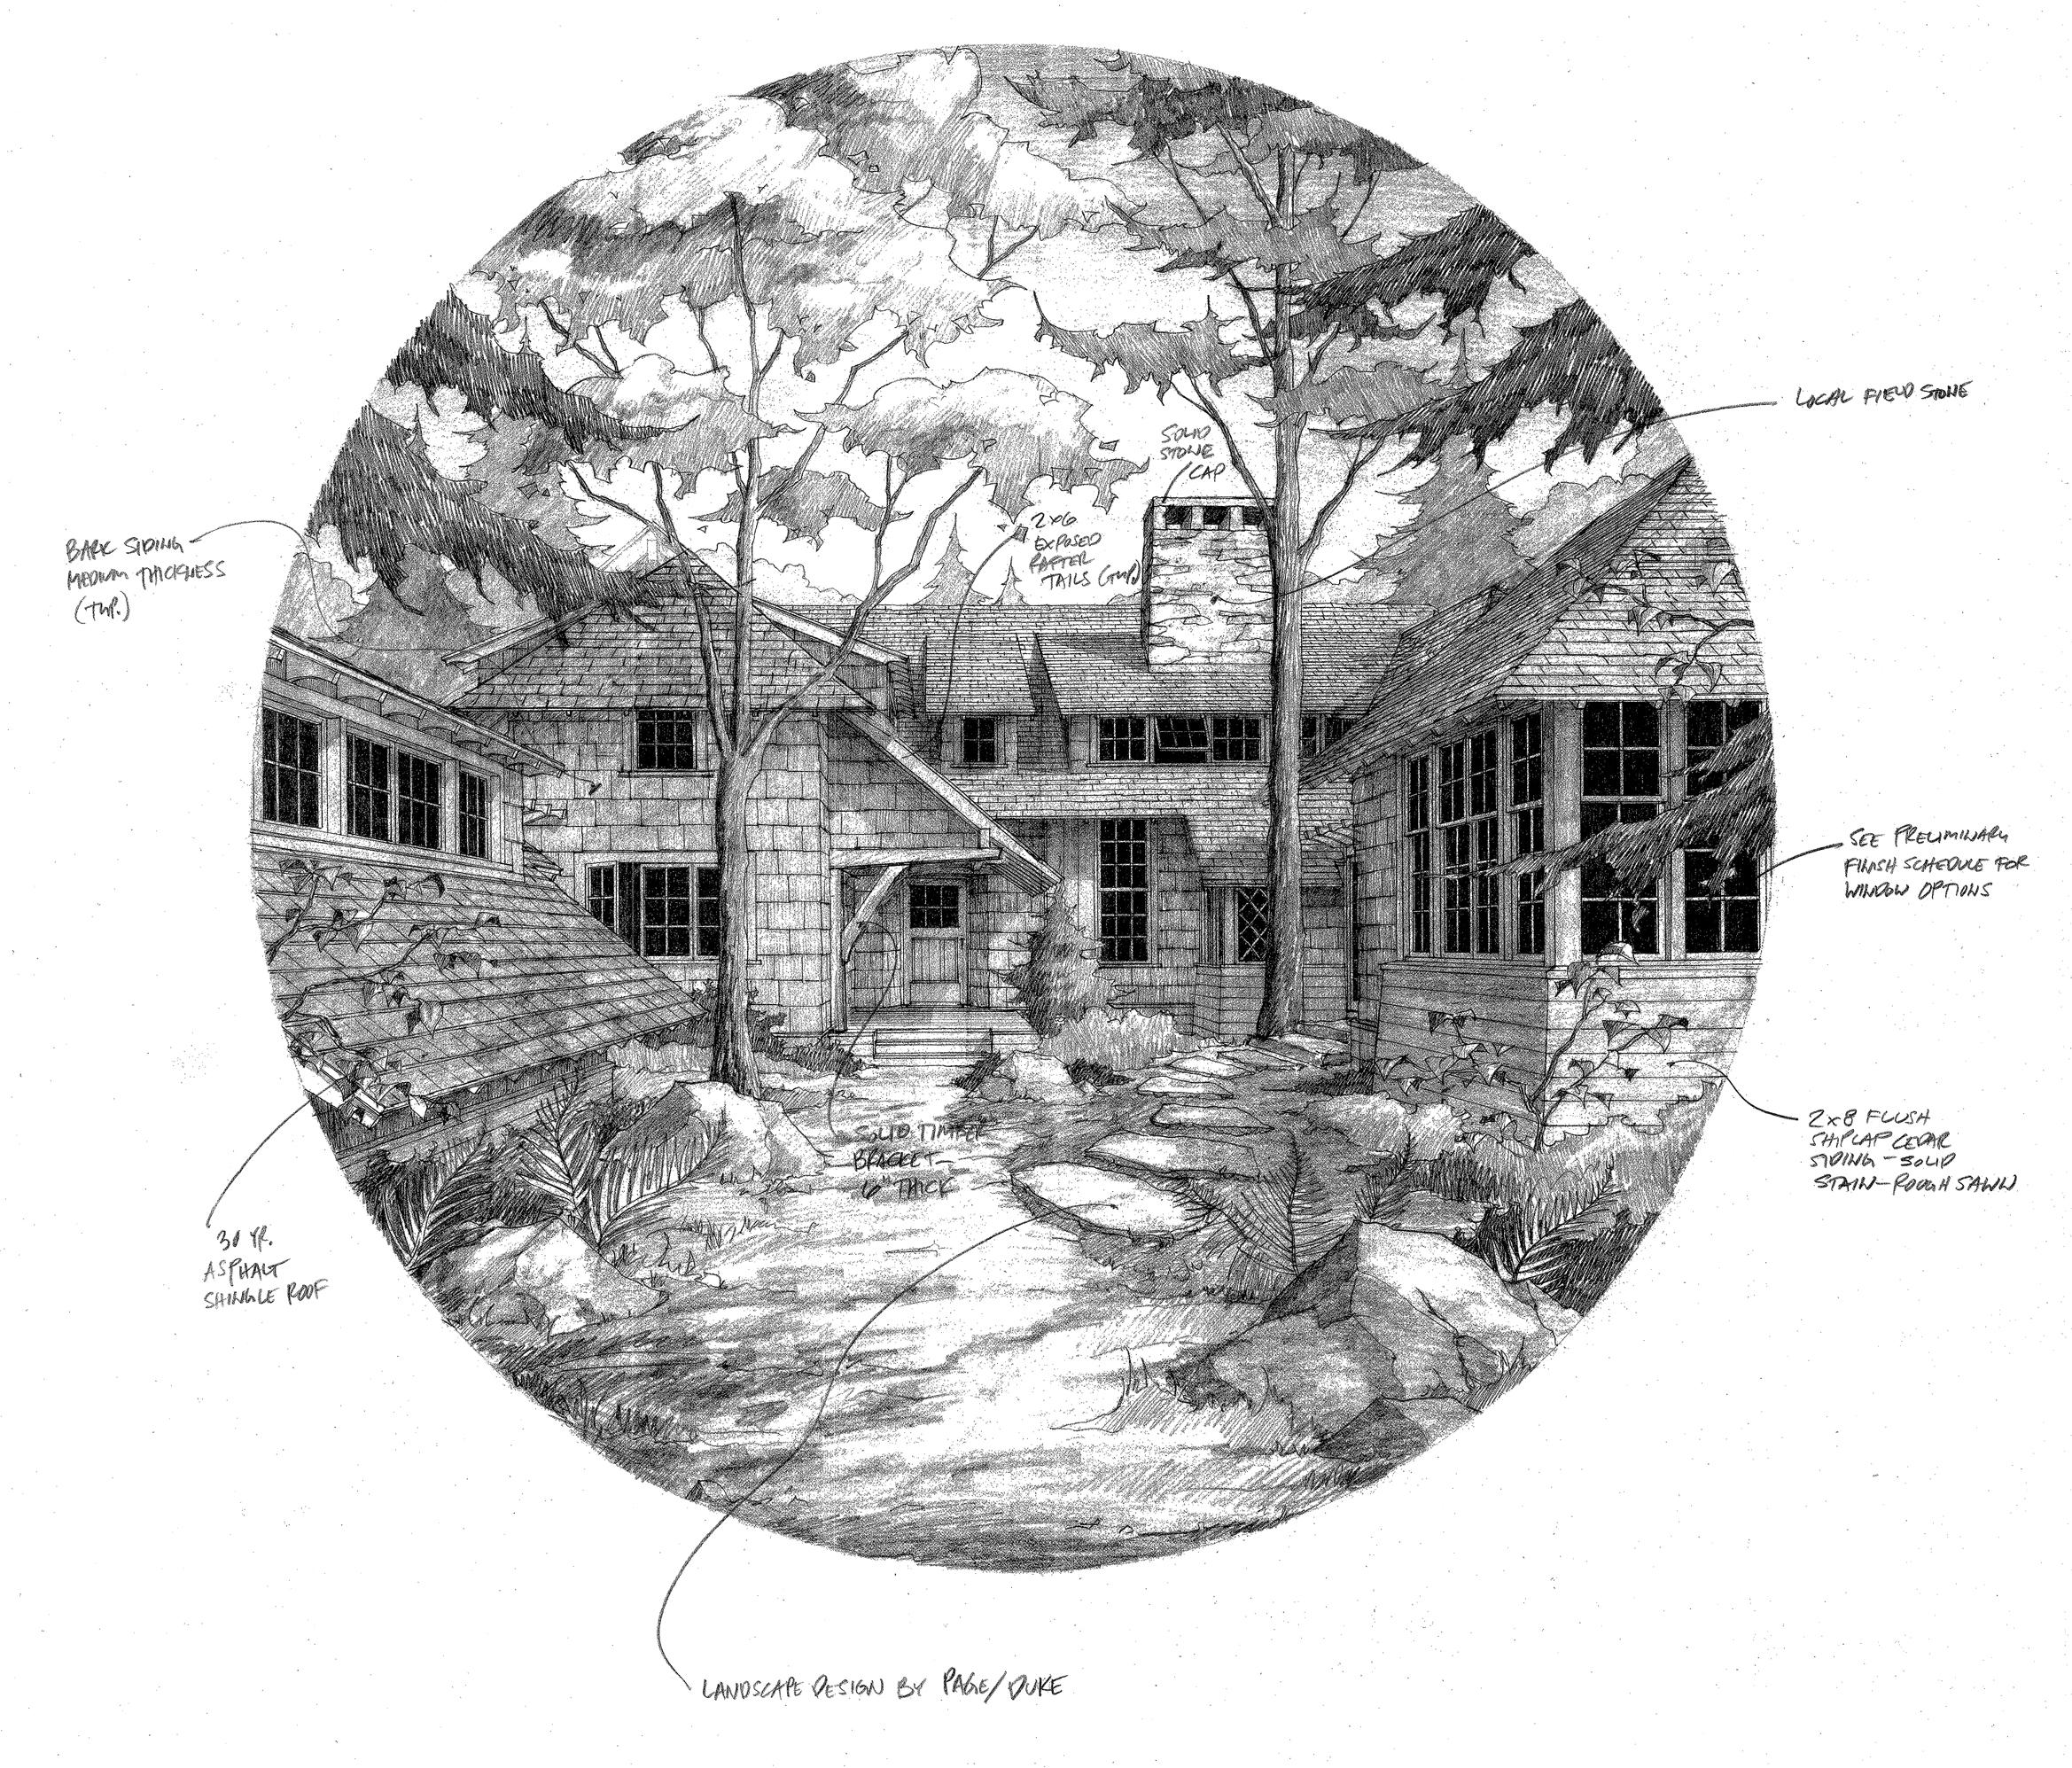 Lake_Placid.New_York.Lake_House.Robert_Orr_&_Associates.Architecture.Landscape_Architecture.Urbanism.Camp.Road_Side_Perspective.Mark_Kline_Del.Pursley_Dixon.jpg